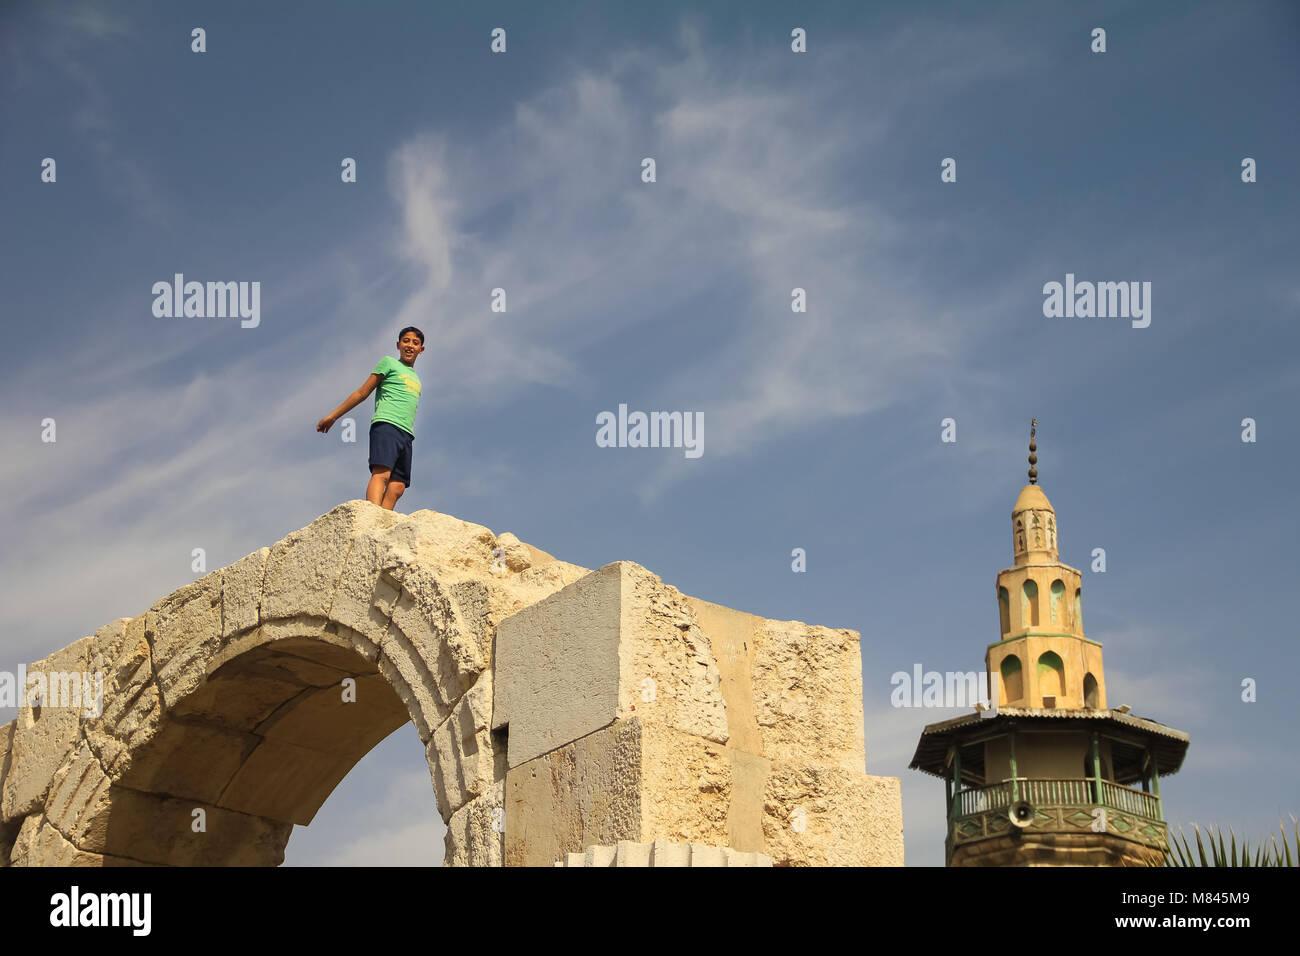 Kids enjoy the game in Damascus. - Stock Image